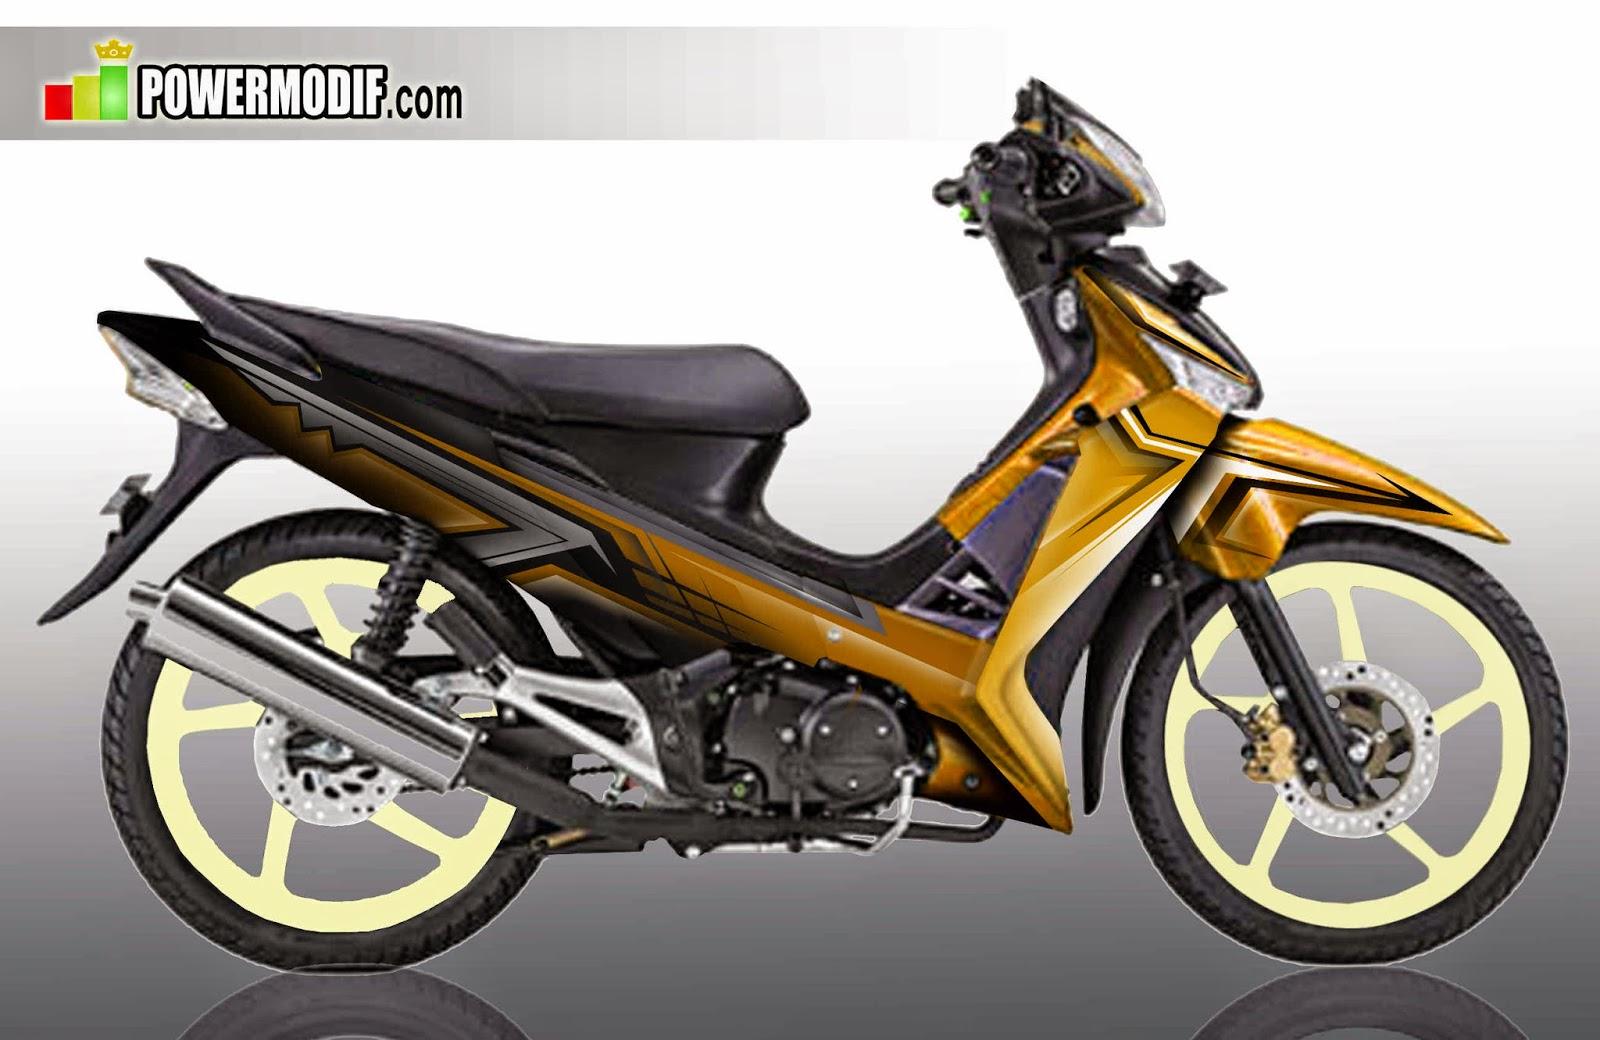 70 Modifikasi Airbrush Motor Supra X 125 Terlengkap Klobot